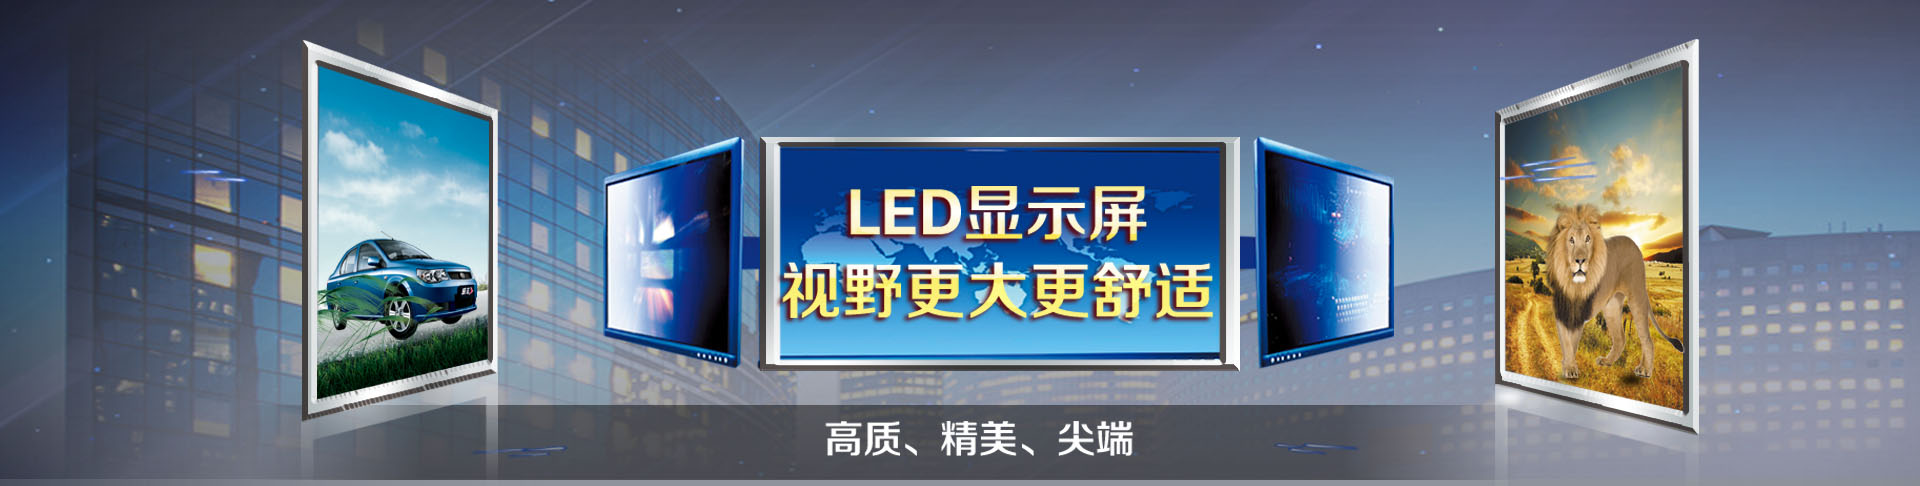 济宁LED显示屏